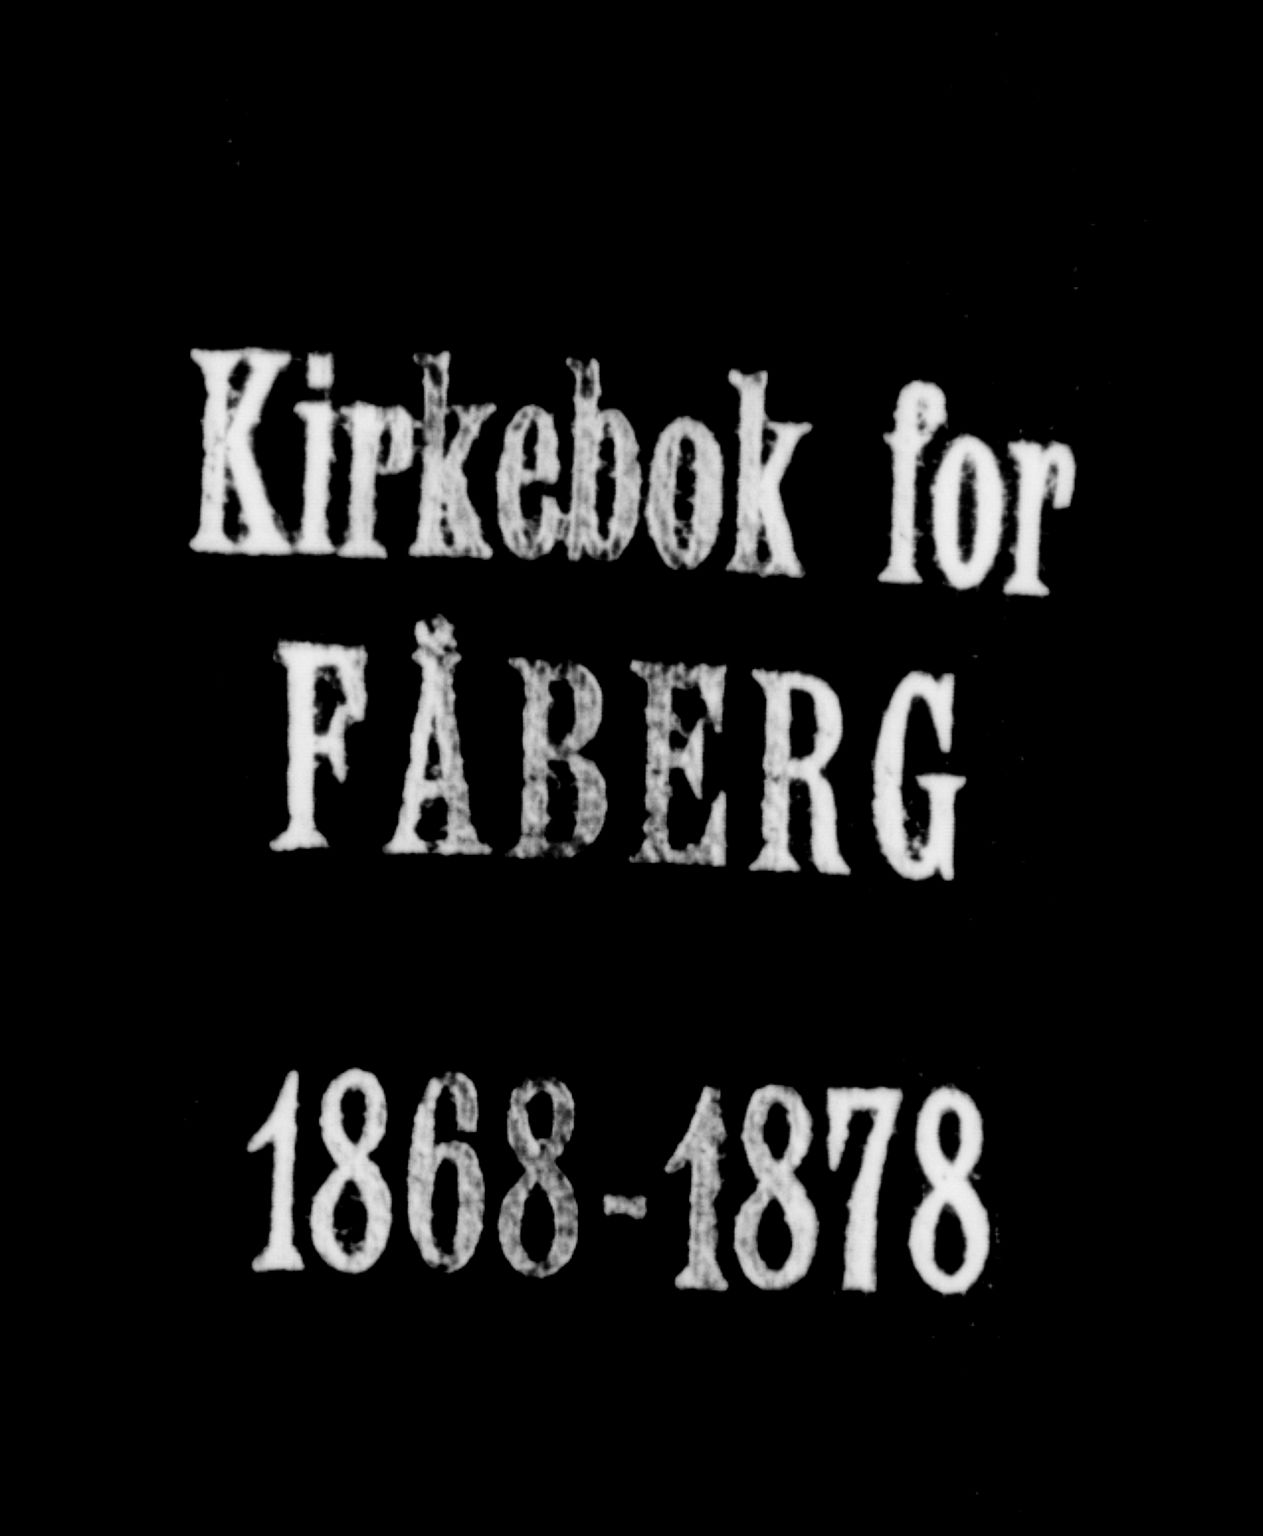 SAH, Fåberg prestekontor, Ministerialbok nr. 7, 1868-1878